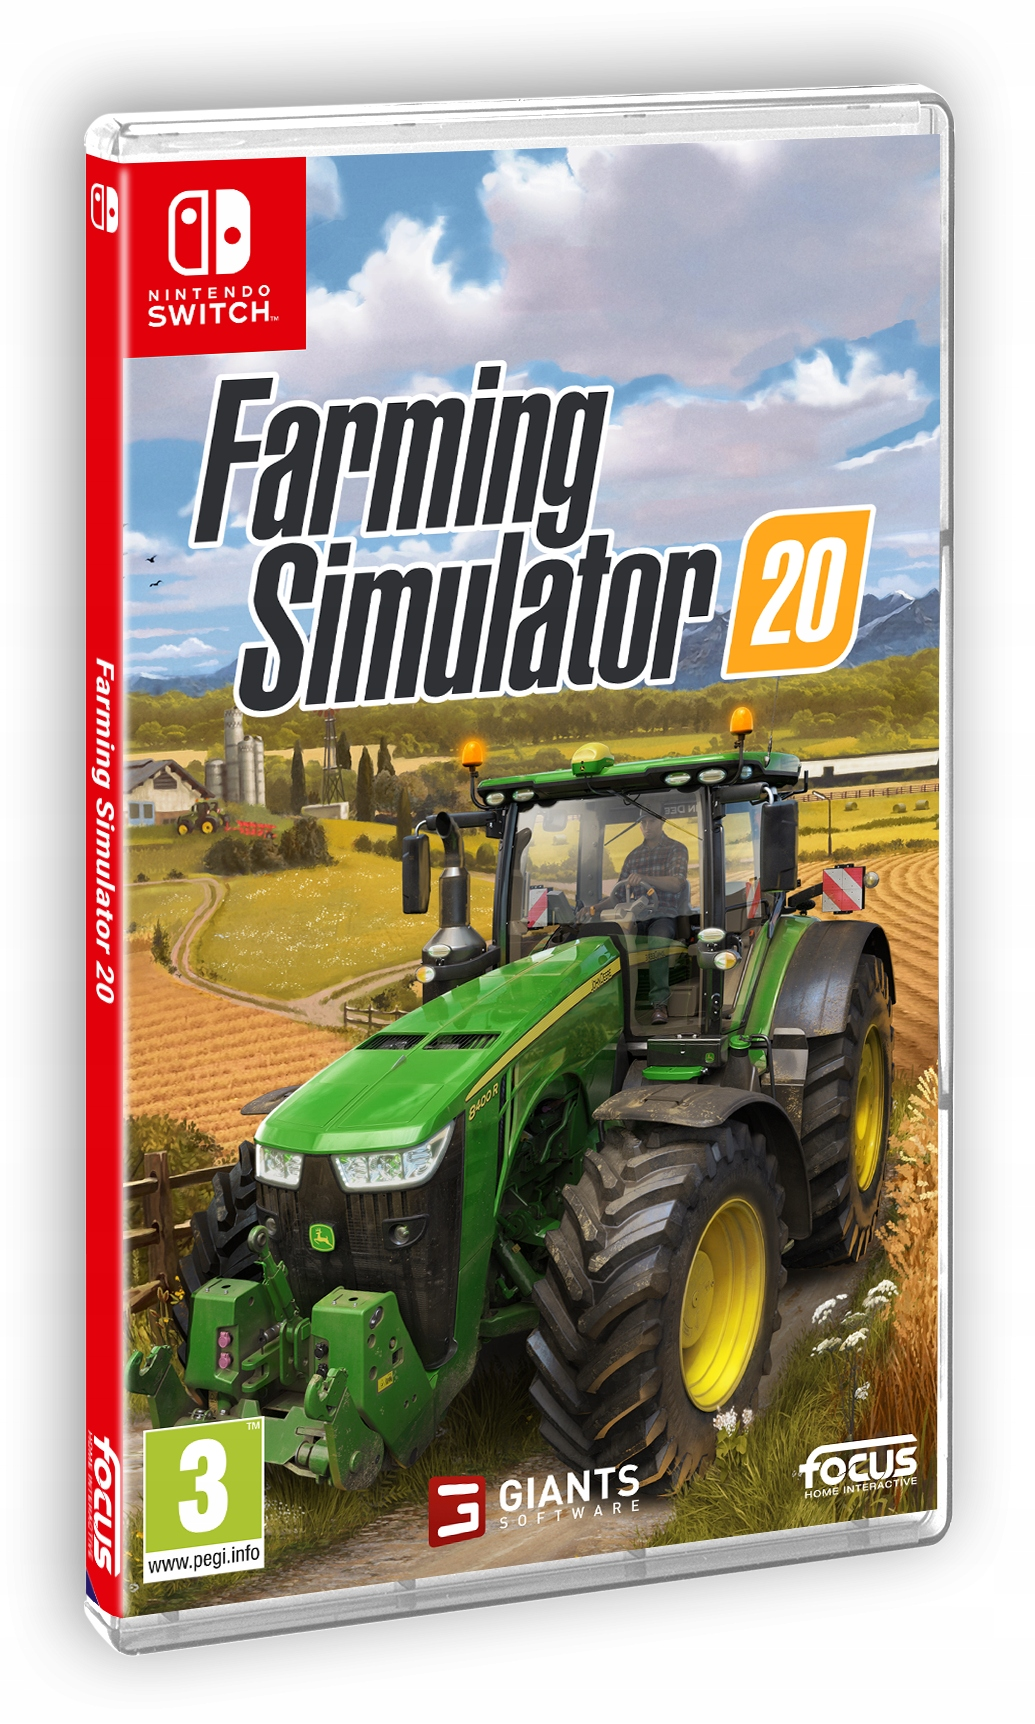 Kierownica Saitek Do Farming Simulator 15 Panel 6631089542 Oficjalne Archiwum Allegro